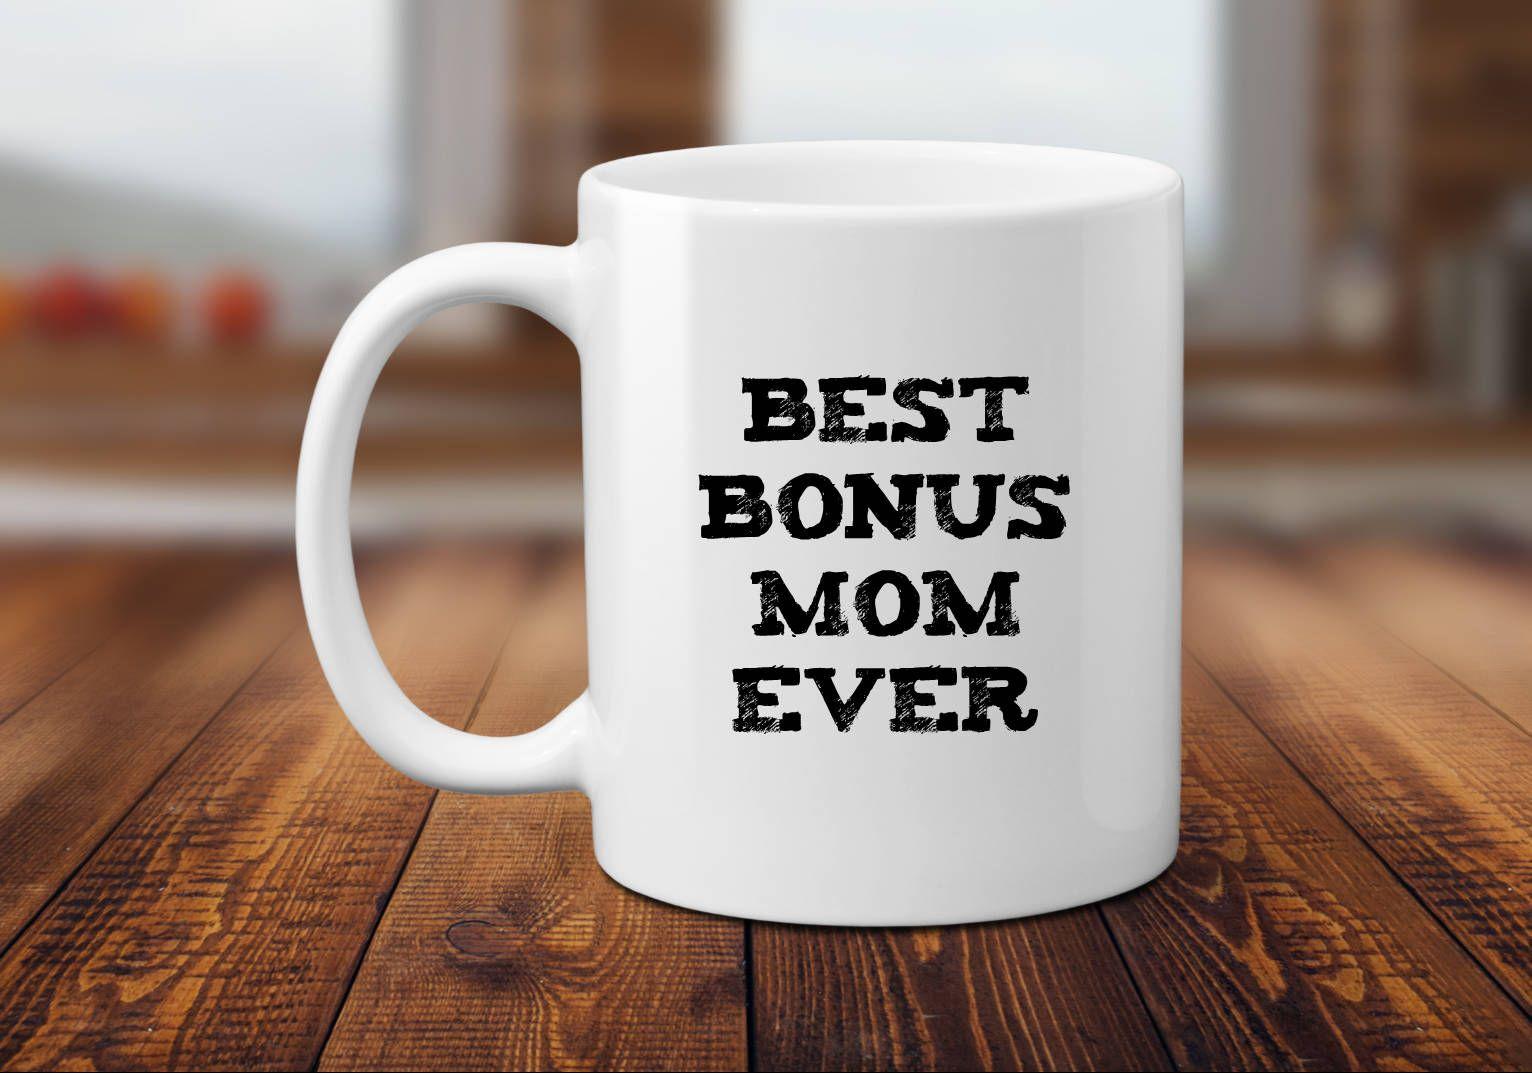 Best bonus mom ever gift for step mom stepmom of bride